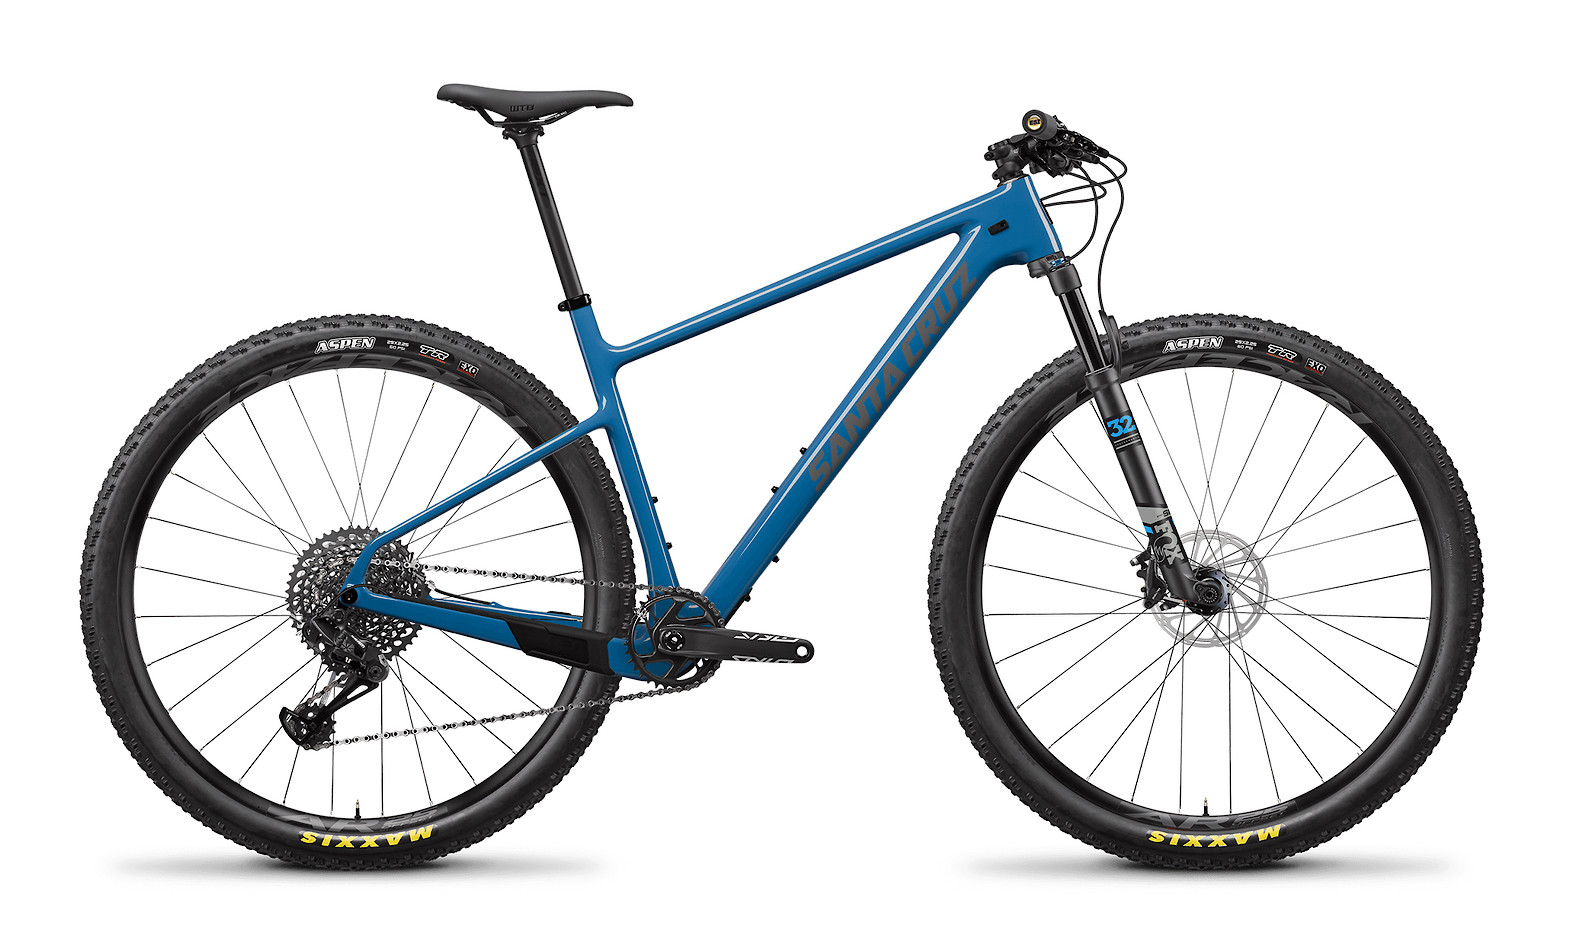 2020 Santa Cruz Highball Carbon C S (WC Blue and Primer)